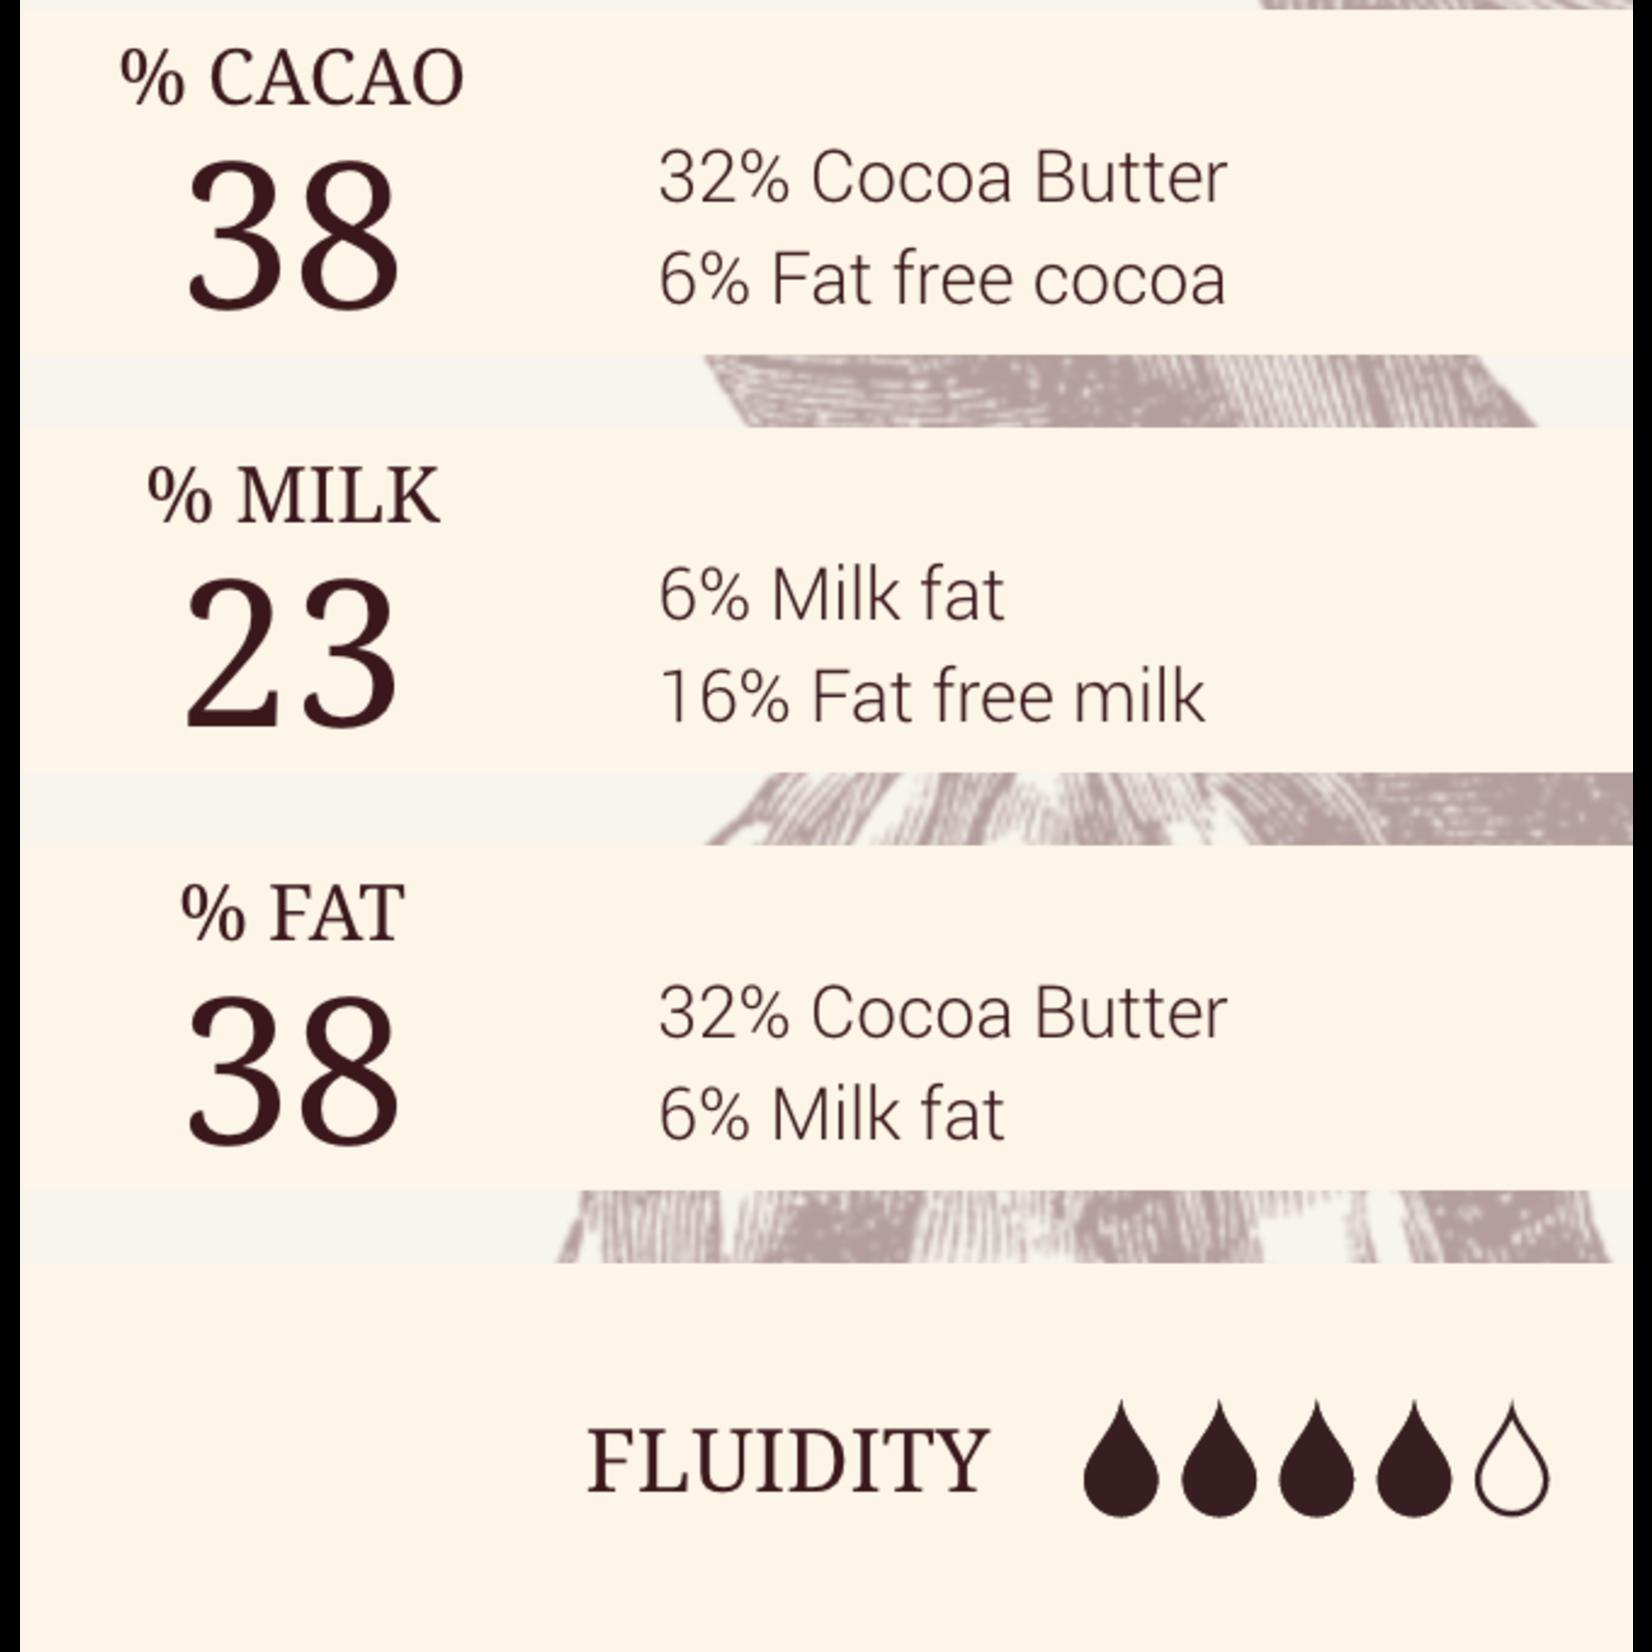 Cacao Barry Cacao Barry - Lactee Superieure Milk Chocolate 38% - 1 lb, CHM-O38LSUP-US-U77-R